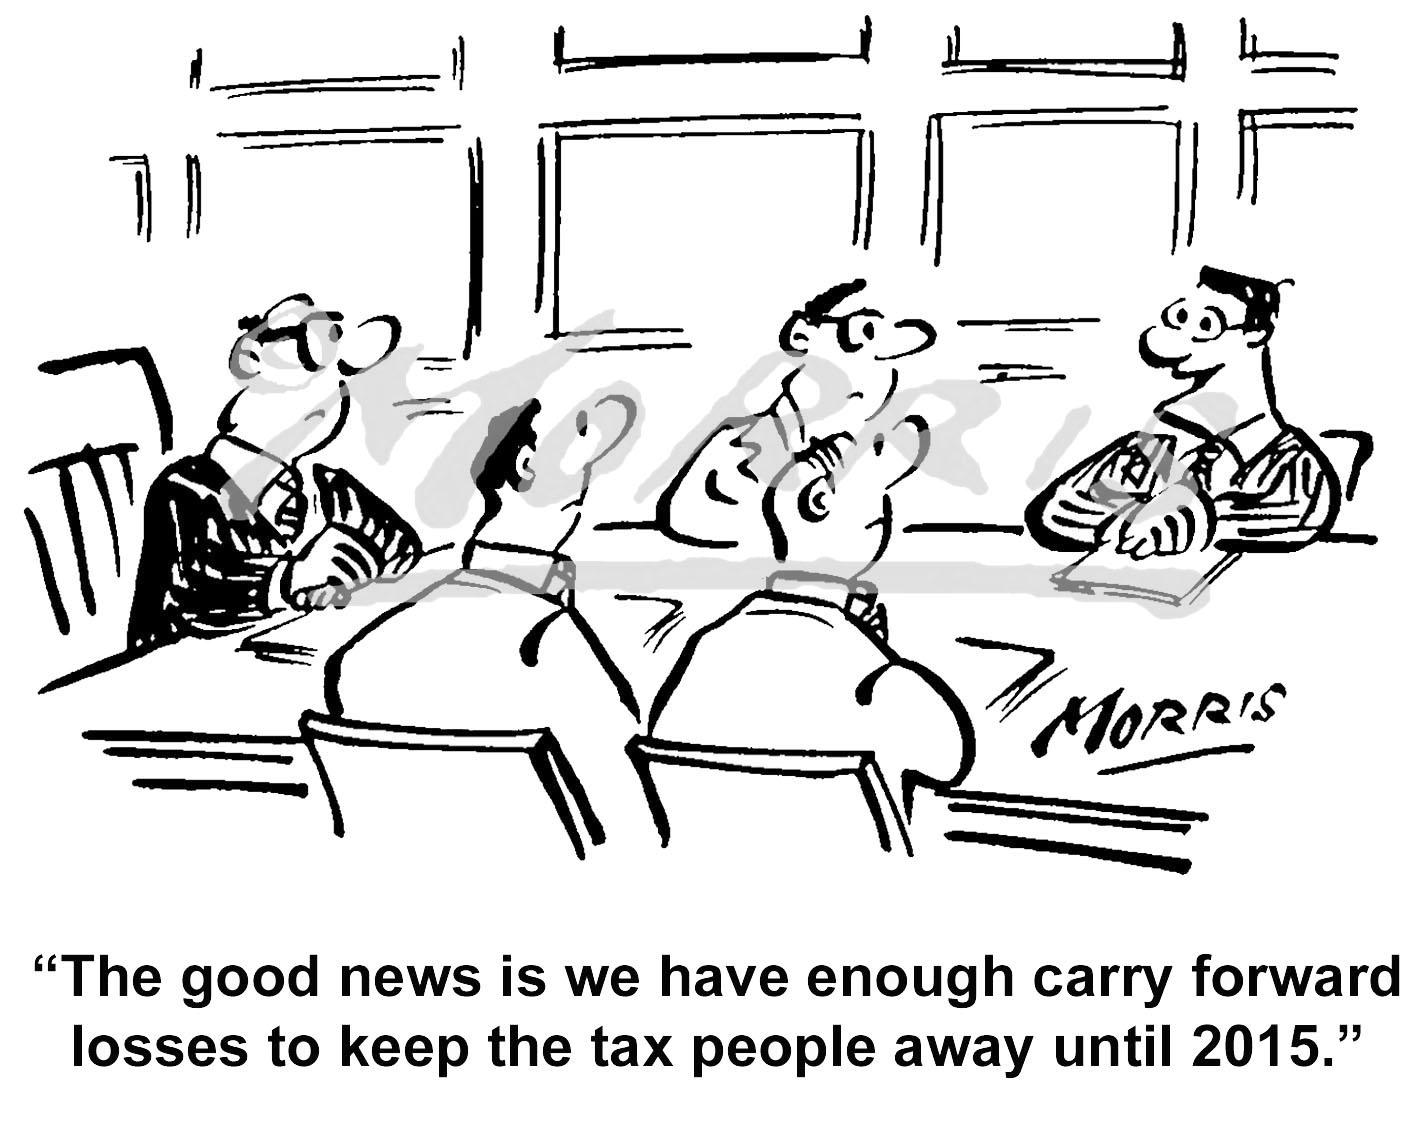 Boardroom meeting tax audit cartoon Ref: 1499bw